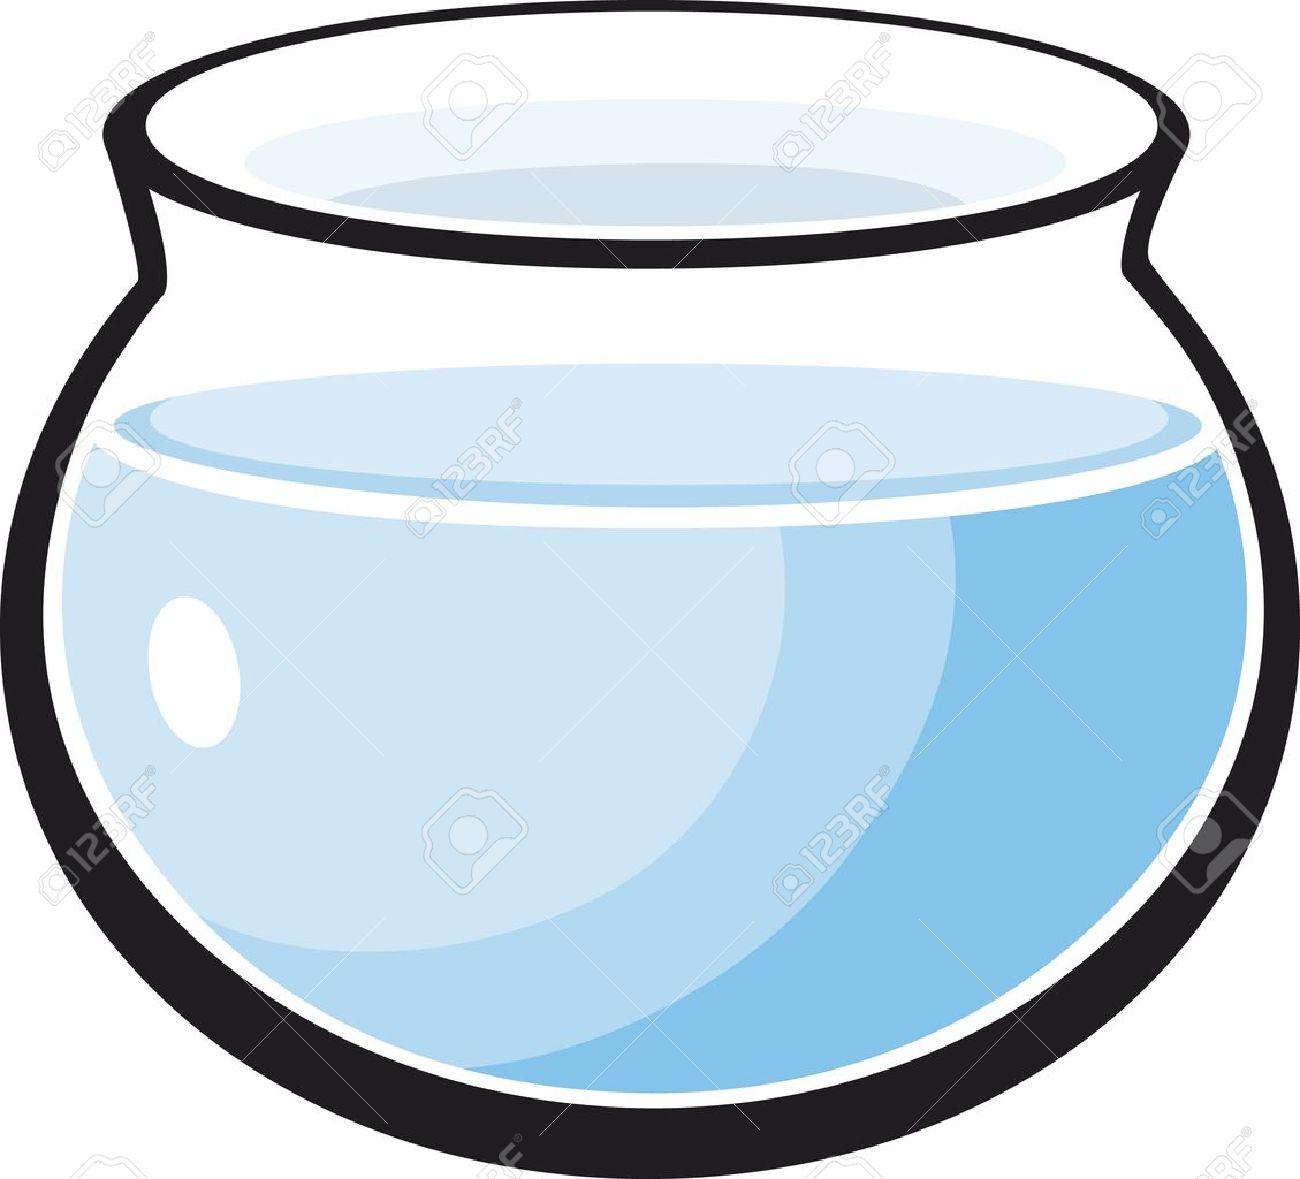 Fish free download best. Aquarium clipart bowl